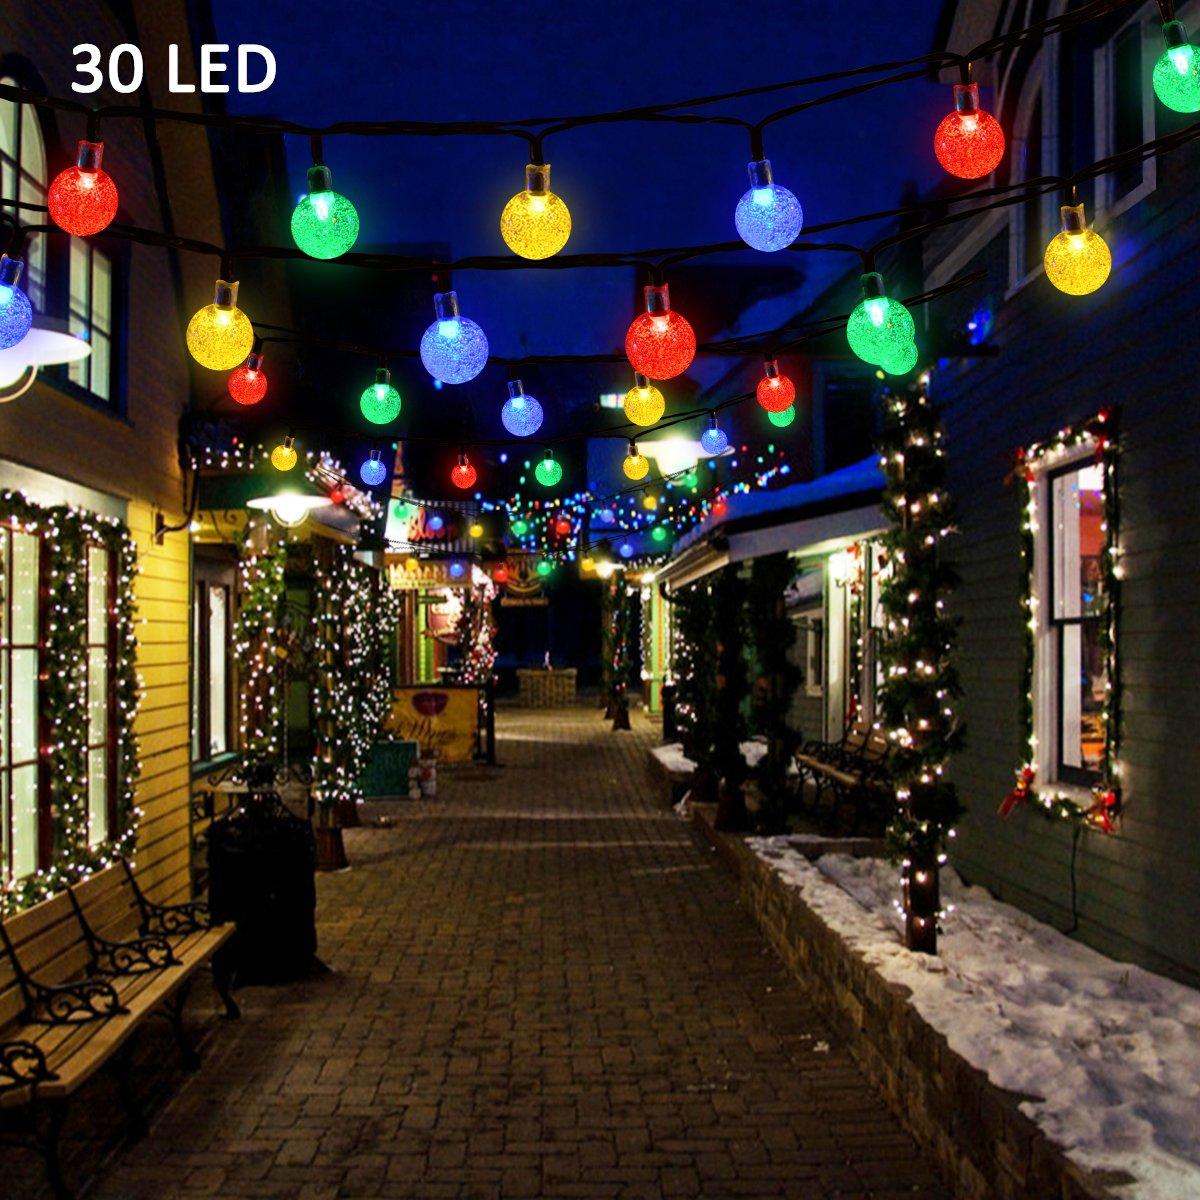 Buy Vmanoo Christmas Solar Powered Globe Lights 30 Led 19 7ft